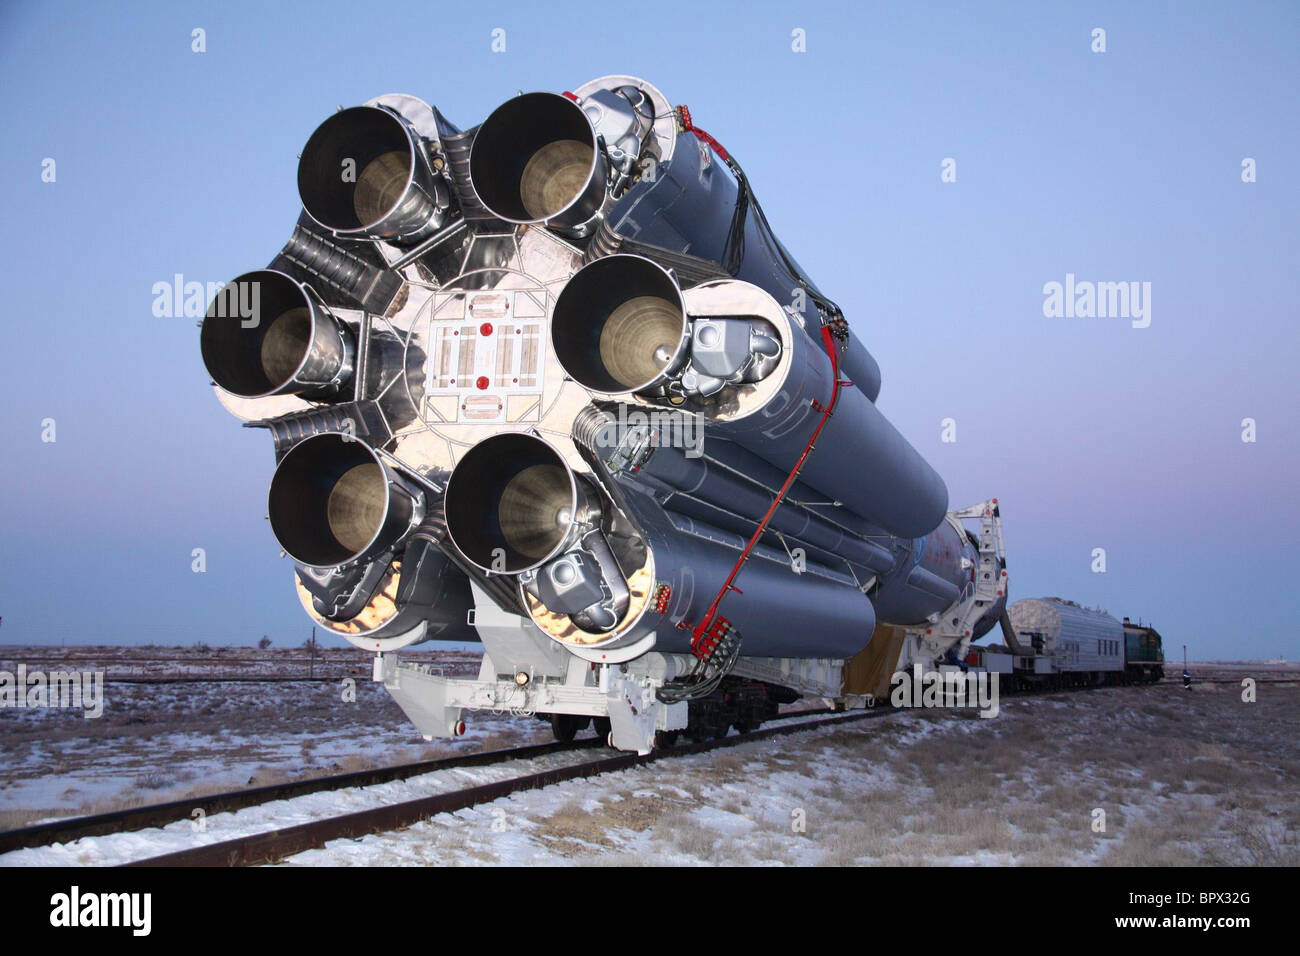 Proton-M rocket to launch Intelsat 16 satellite into space